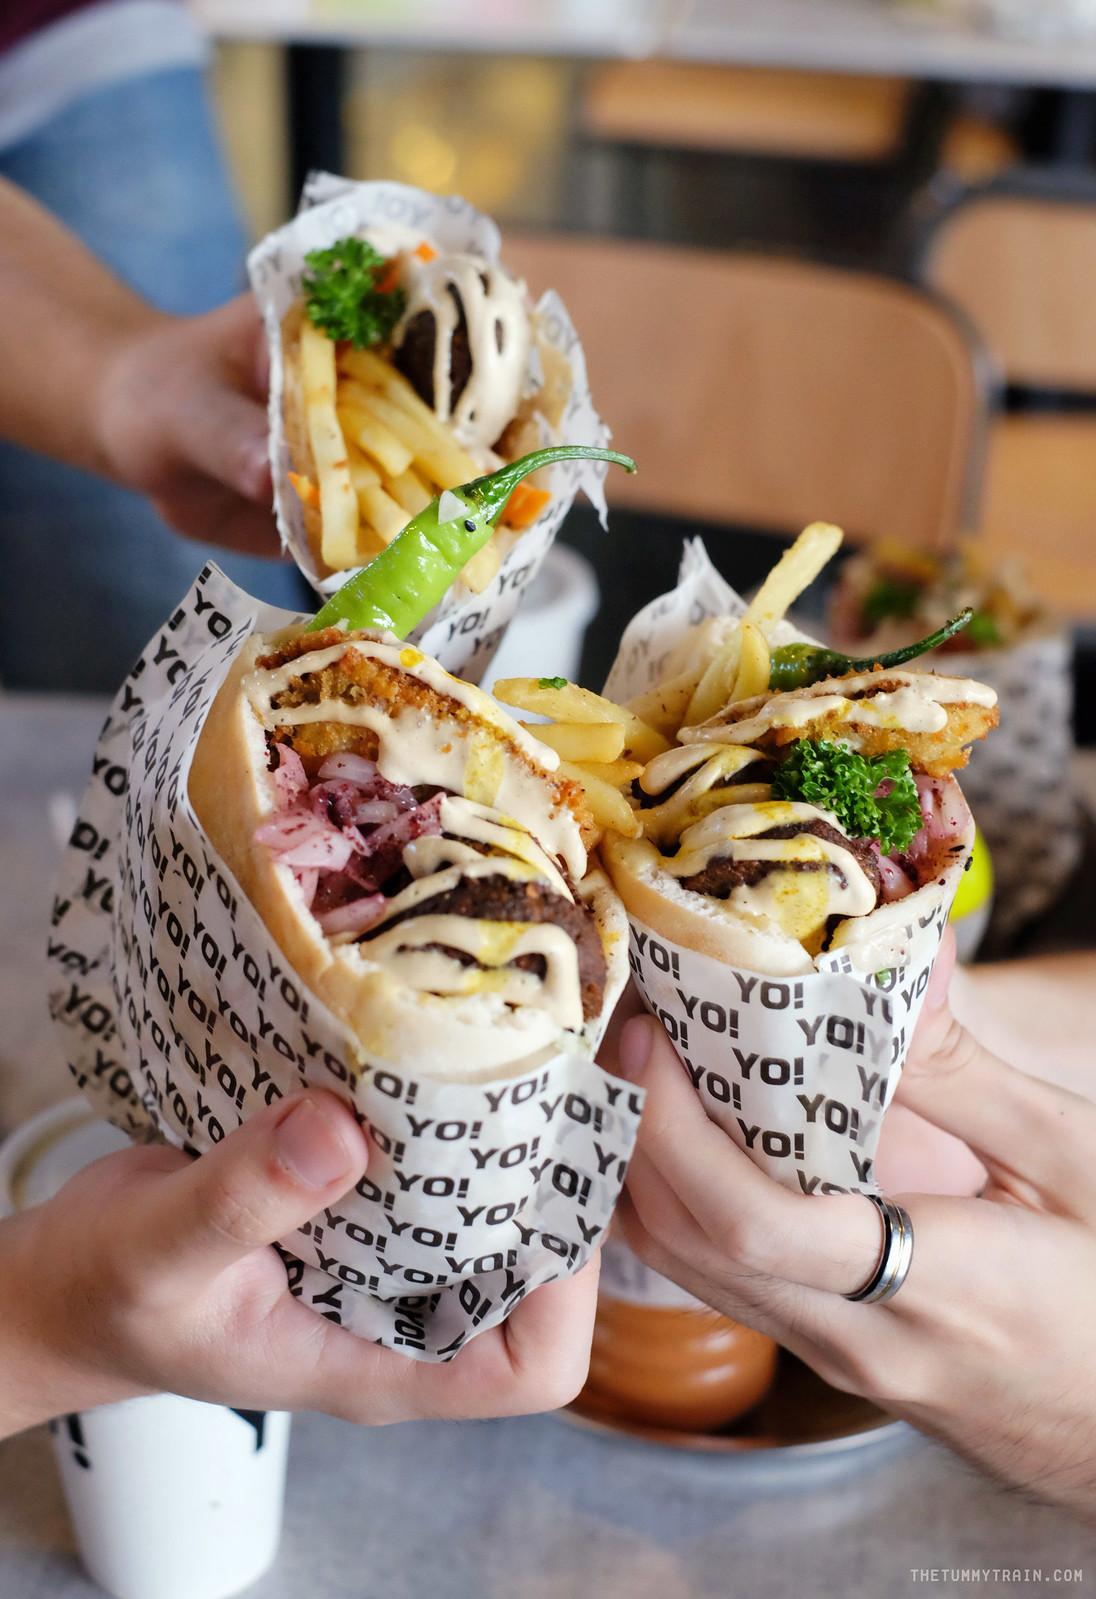 36113609056 774d8e808e h - Eat or Retreat? Falafel Yo! at Greenbelt 3 Cinema Level